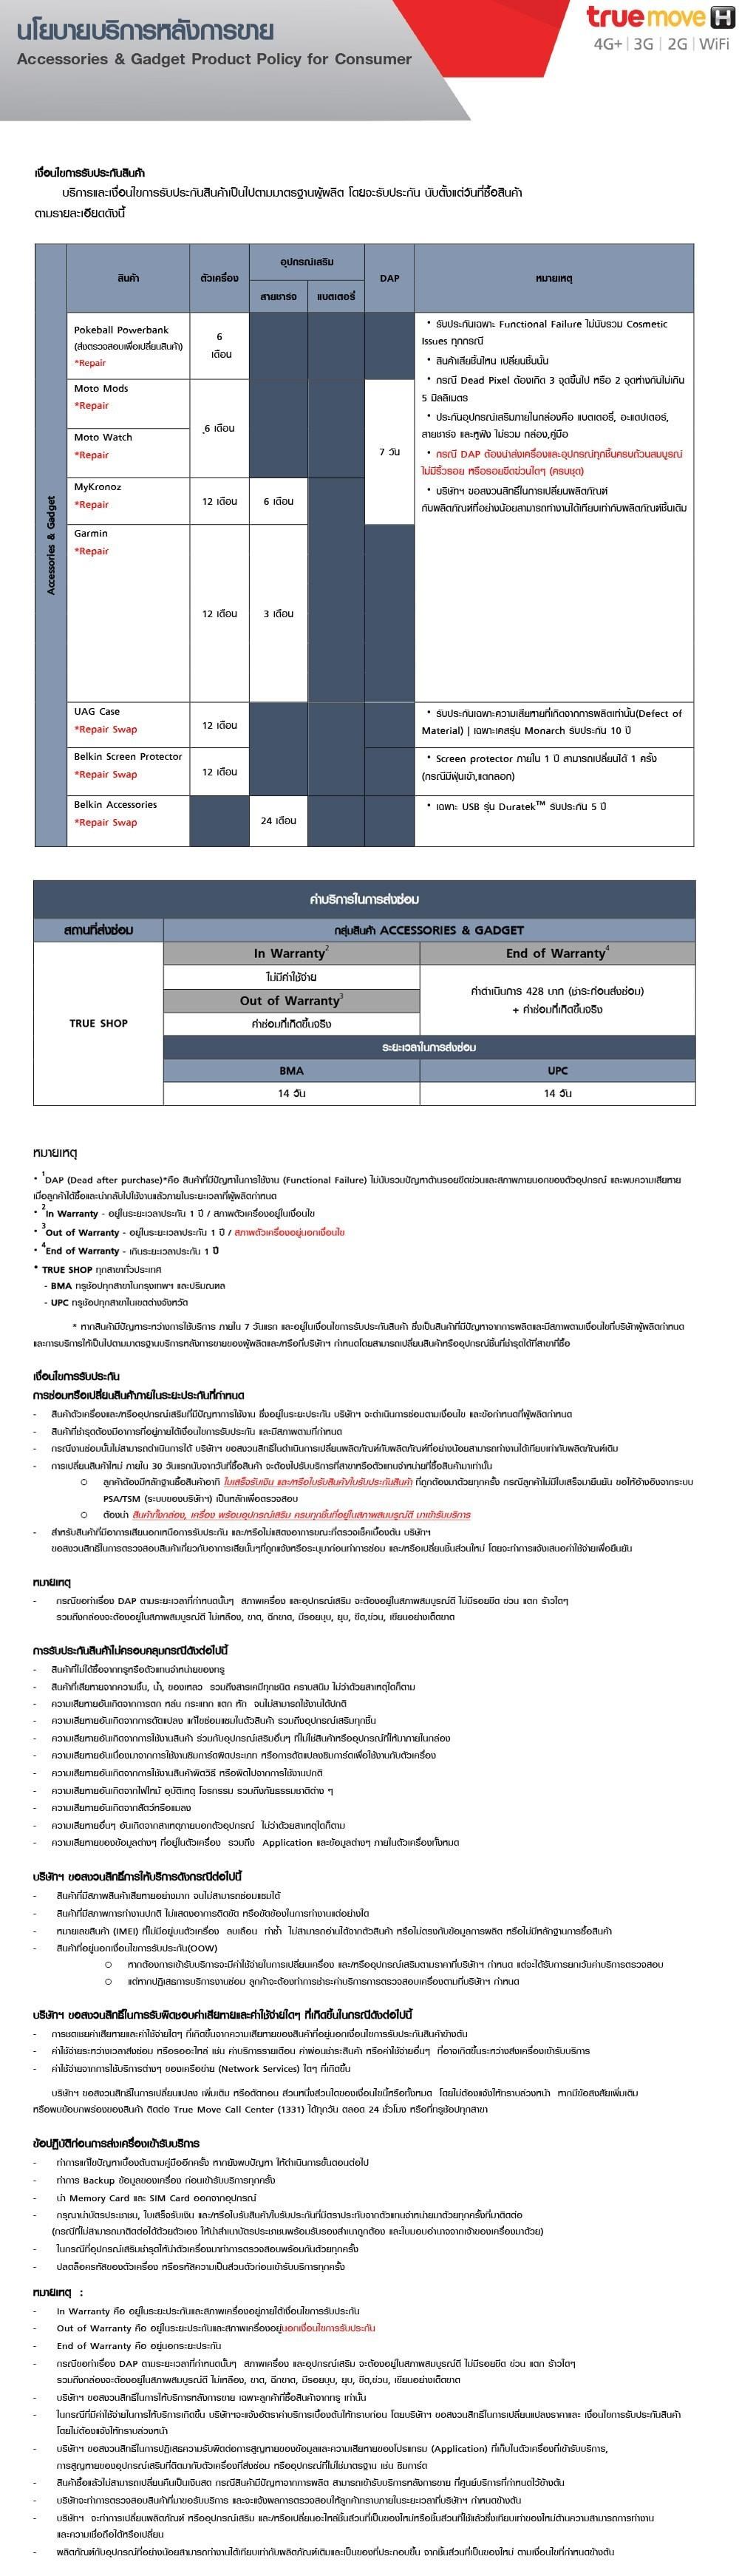 c06-belkinboostupwirelesschargingpad10w%